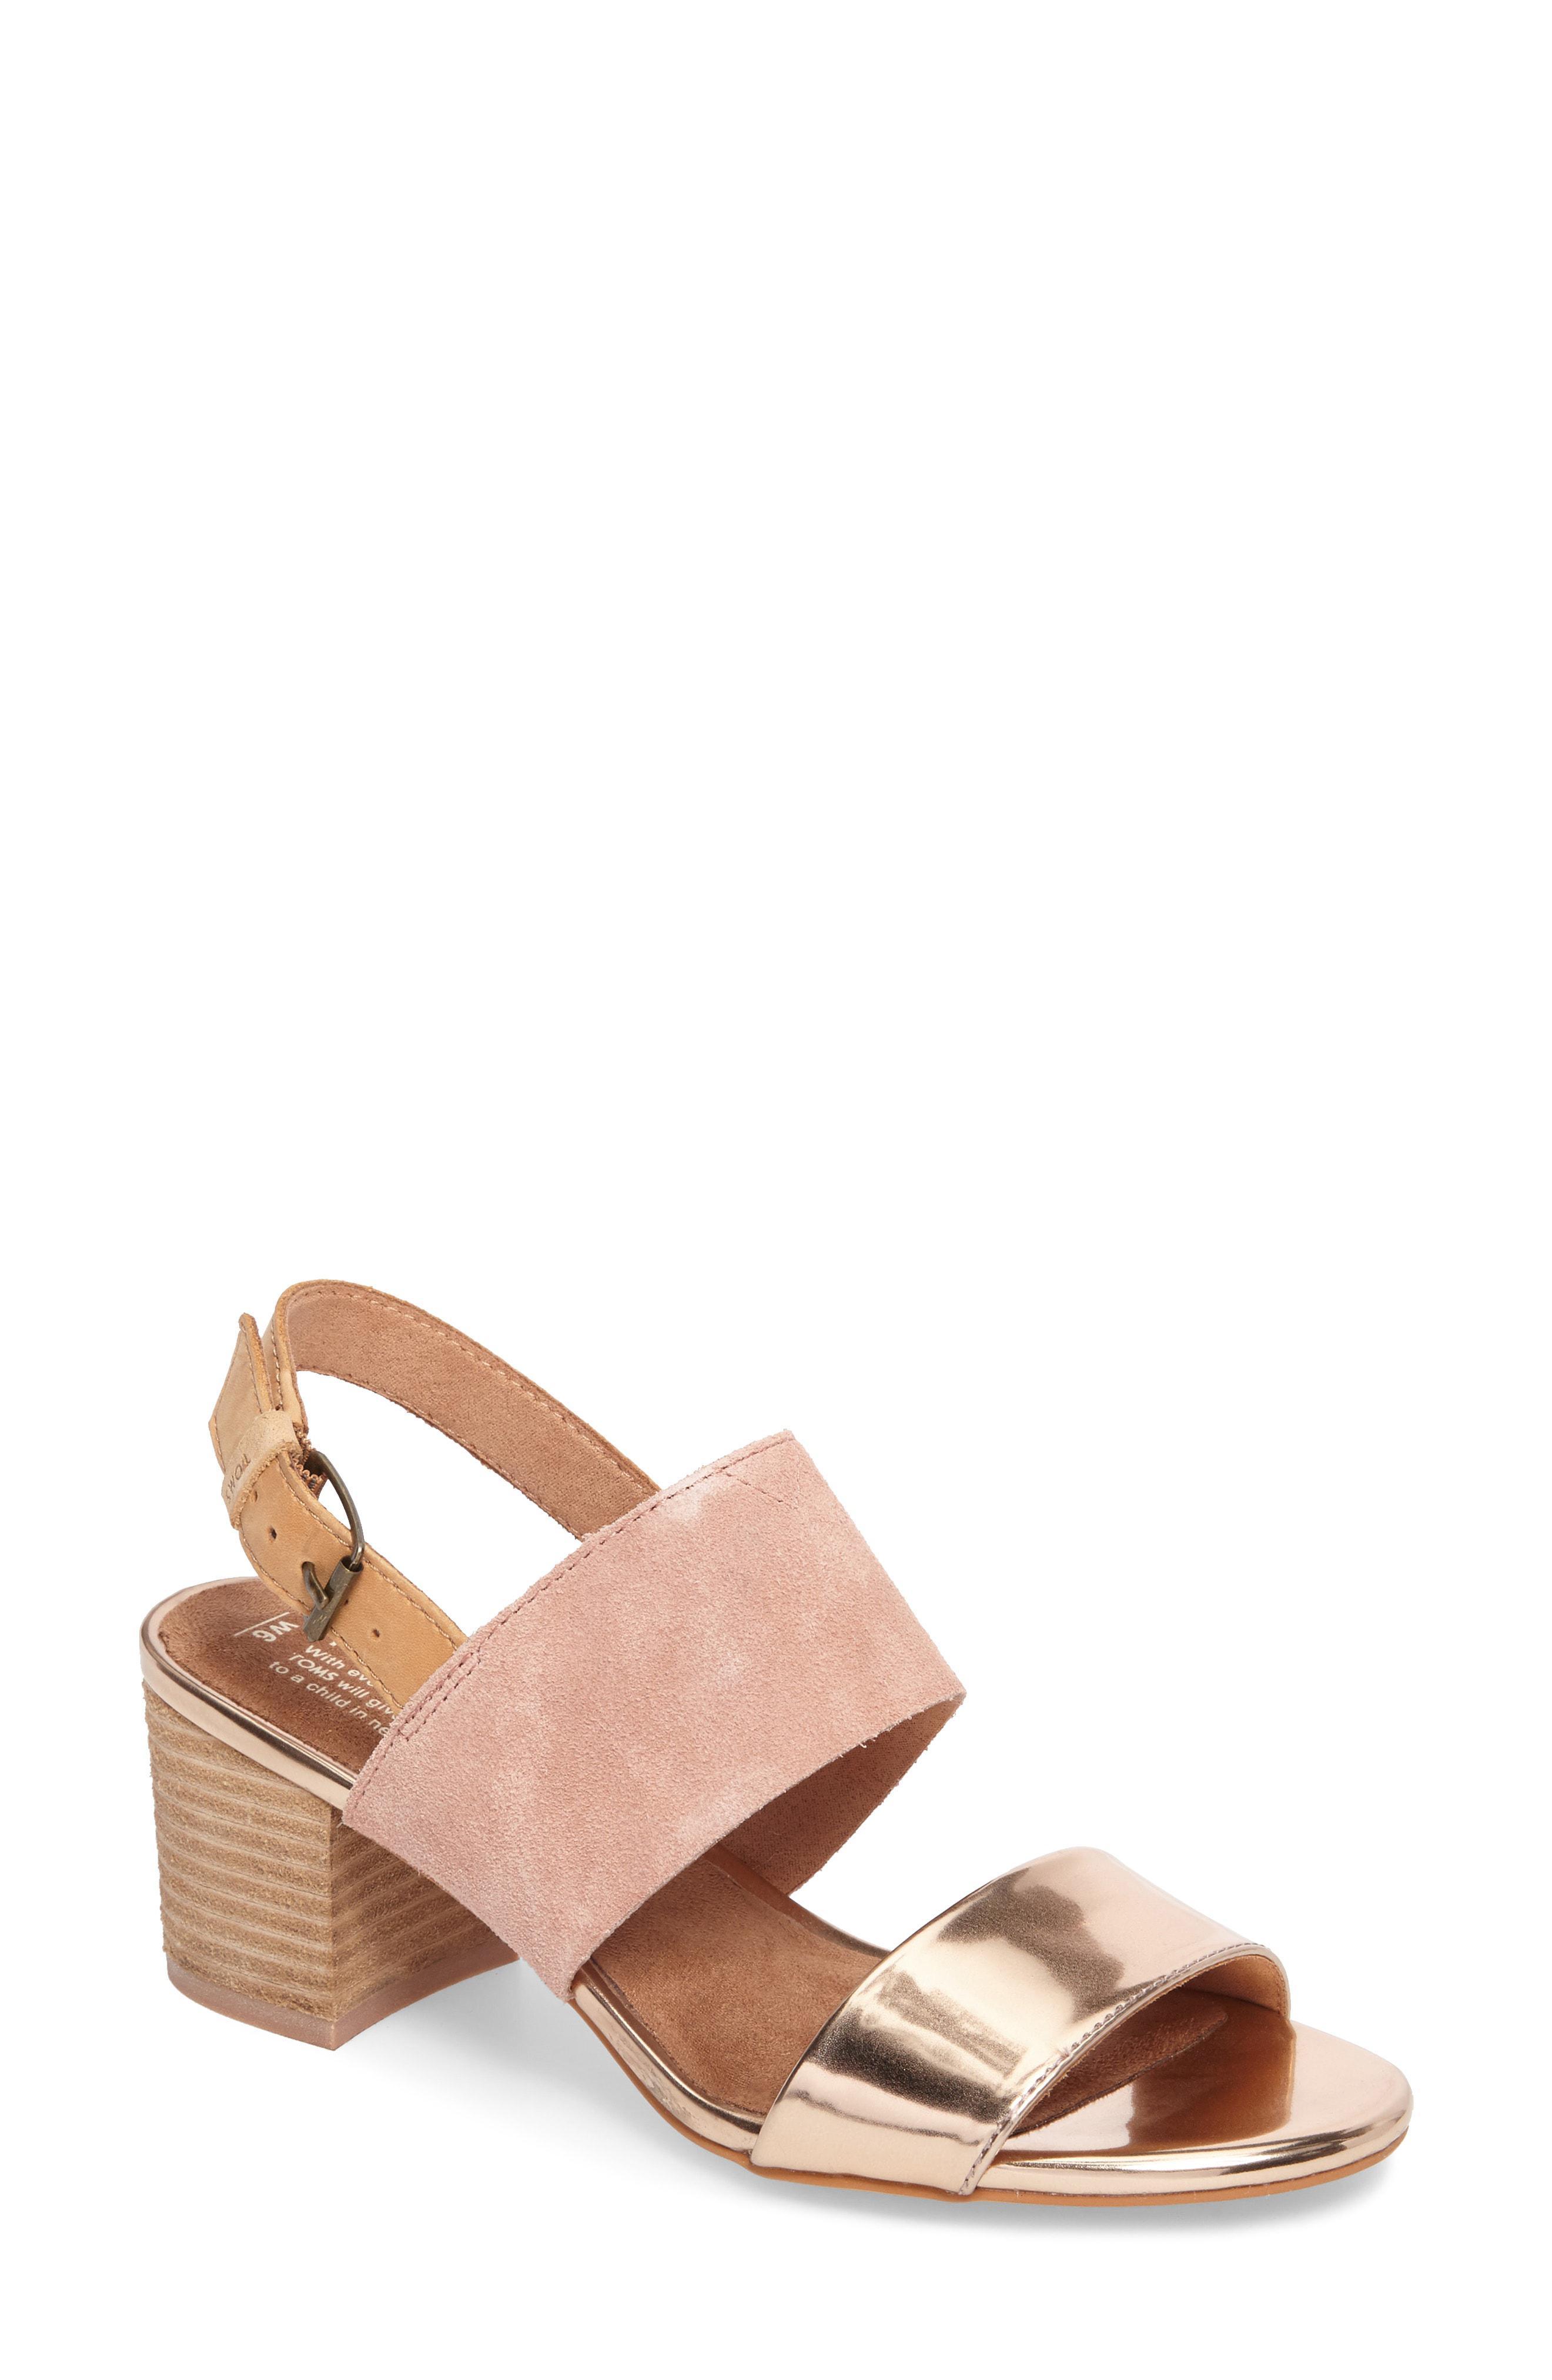 f4c79ecb8 Toms Poppy Sandal in Pink - Save 10.606060606060609% - Lyst